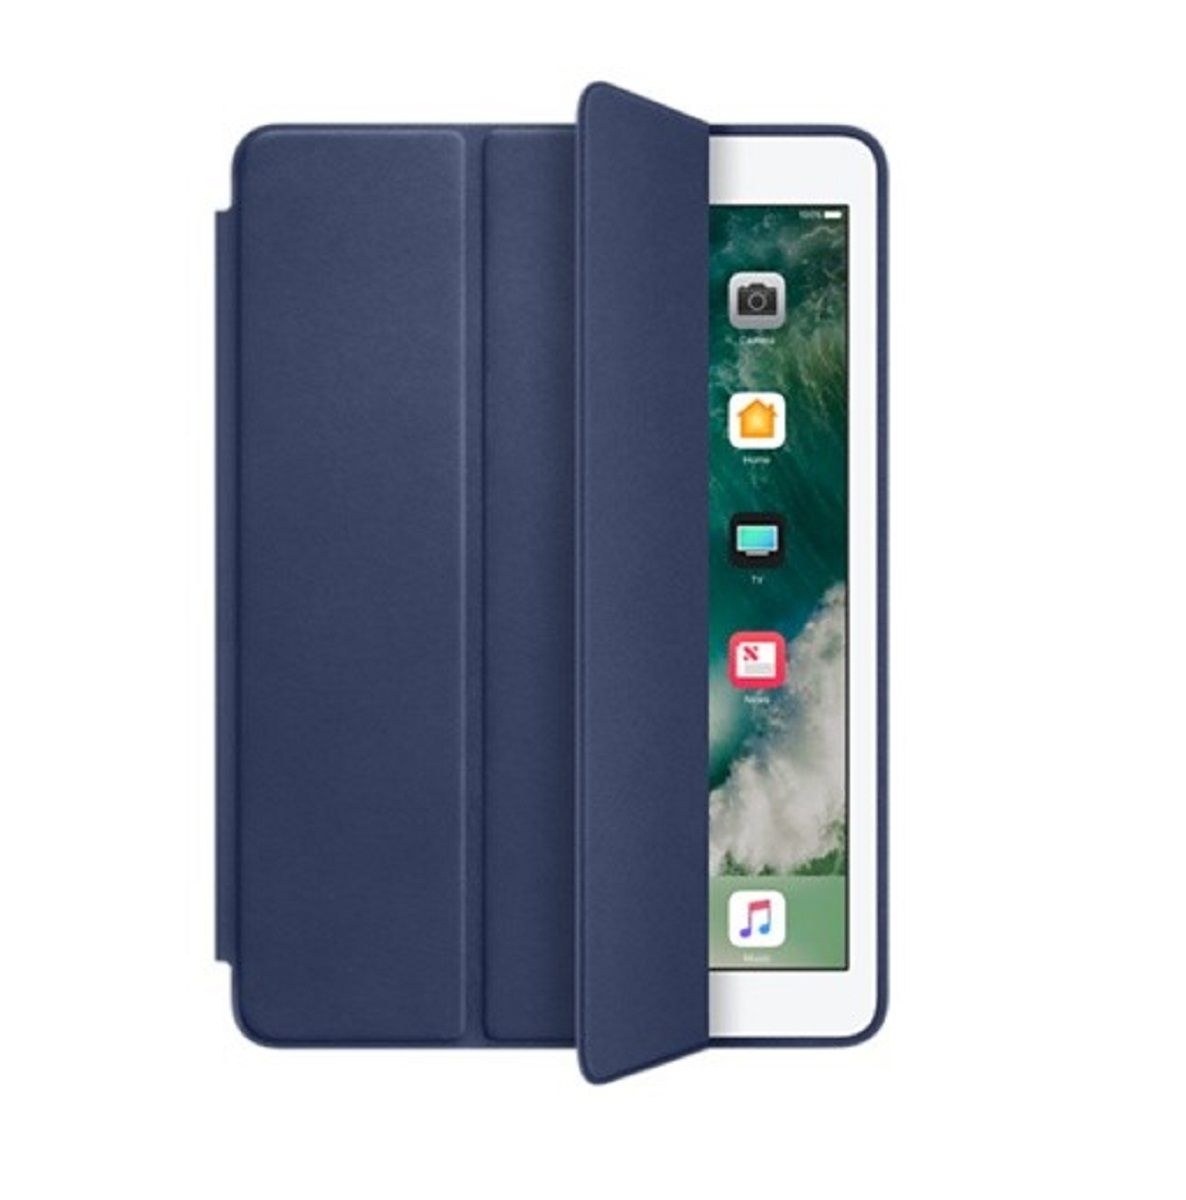 Smart Case Ipad 7 Tela 10.2 Ano 2019 A2197 A2198 A2199 Azul Marinho